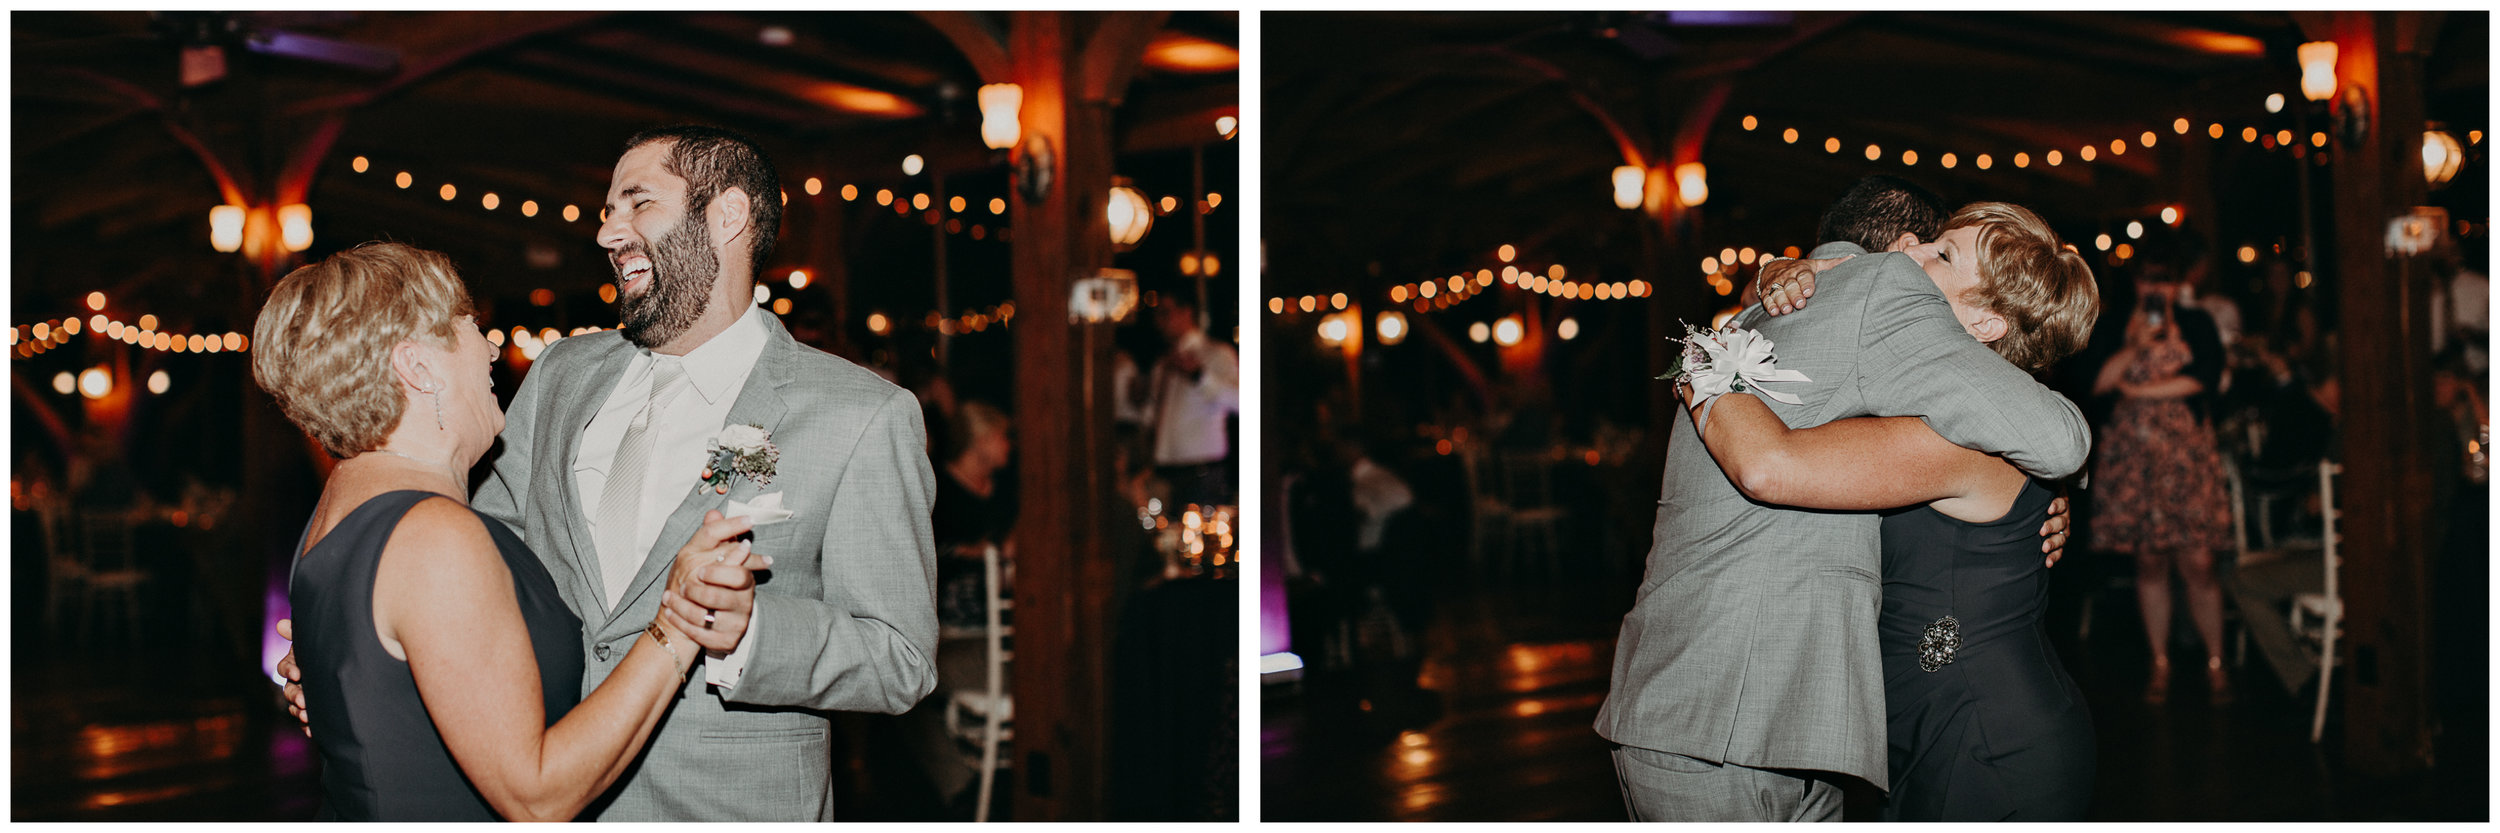 87  wedding day portraits bride and groom atlanta - georgia - ga wedding details - photographer .jpg